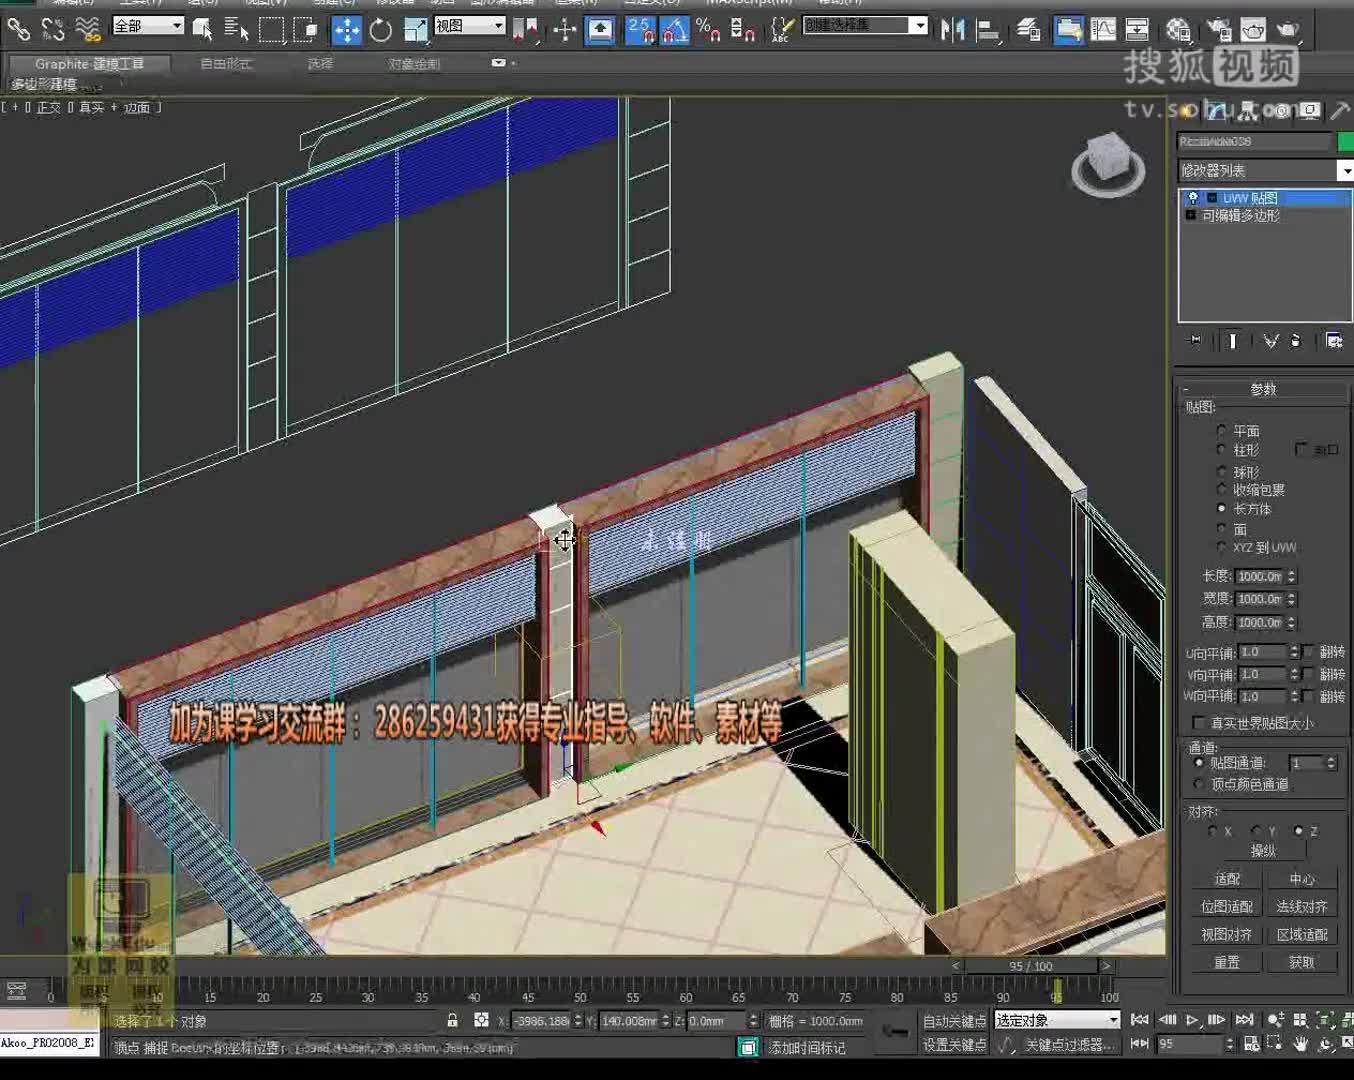 3dmax入门教程3dmax室内设计效果图3dmax案例教程3dmax渲染建模教程